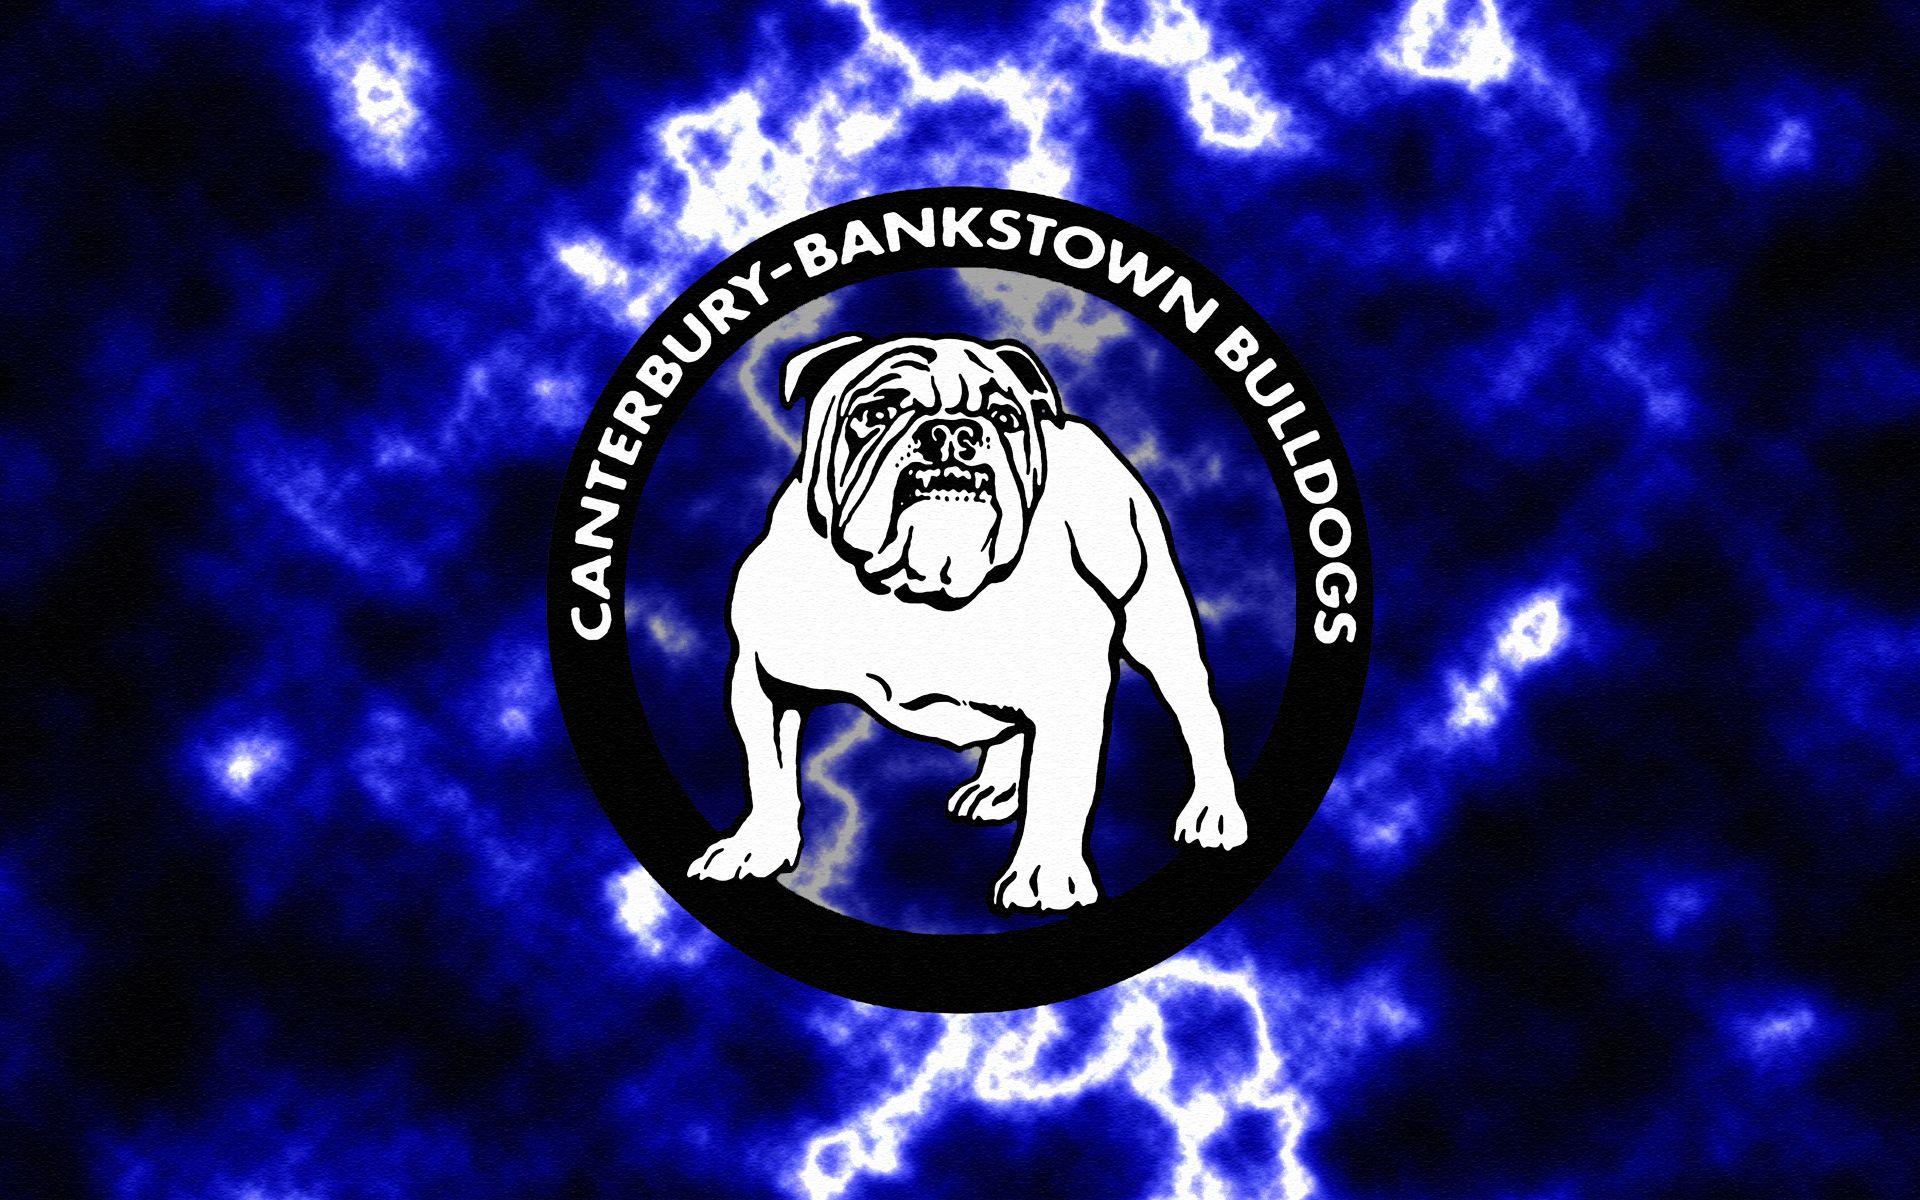 Canterbury Bankstown Bulldogs Lightning Wallpaper By Sunnyboiiii